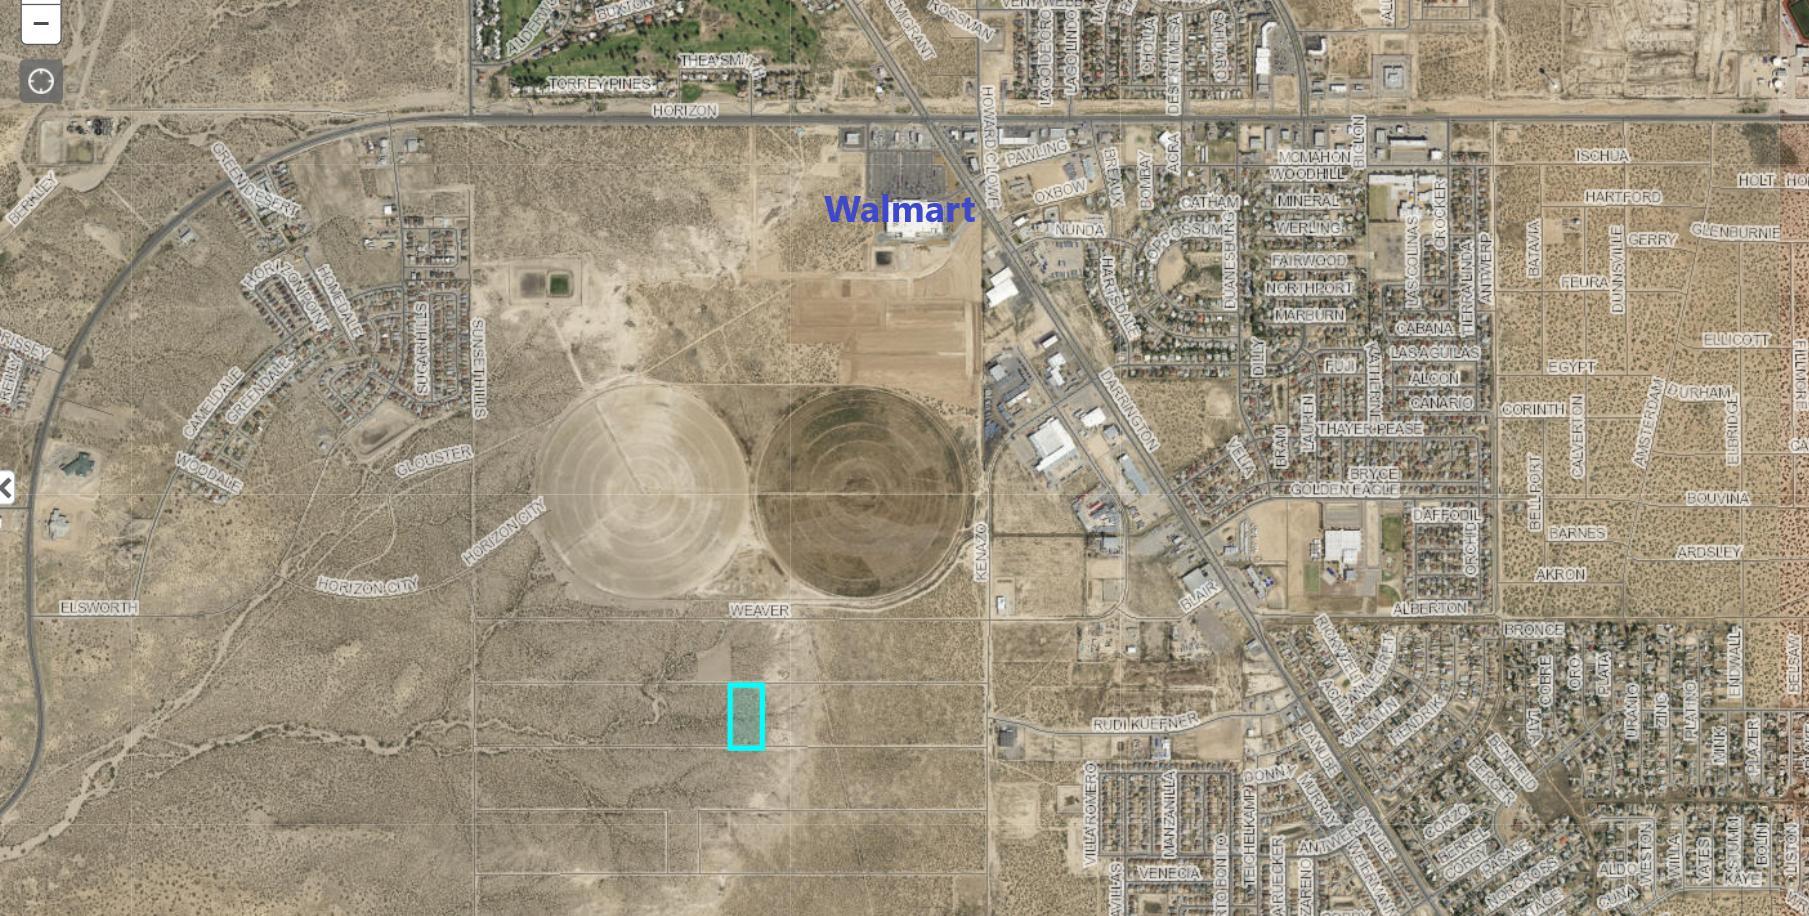 1 Leigh Clark Avenue, Horizon City, Texas 79928, ,Land,For sale,Leigh Clark,811941